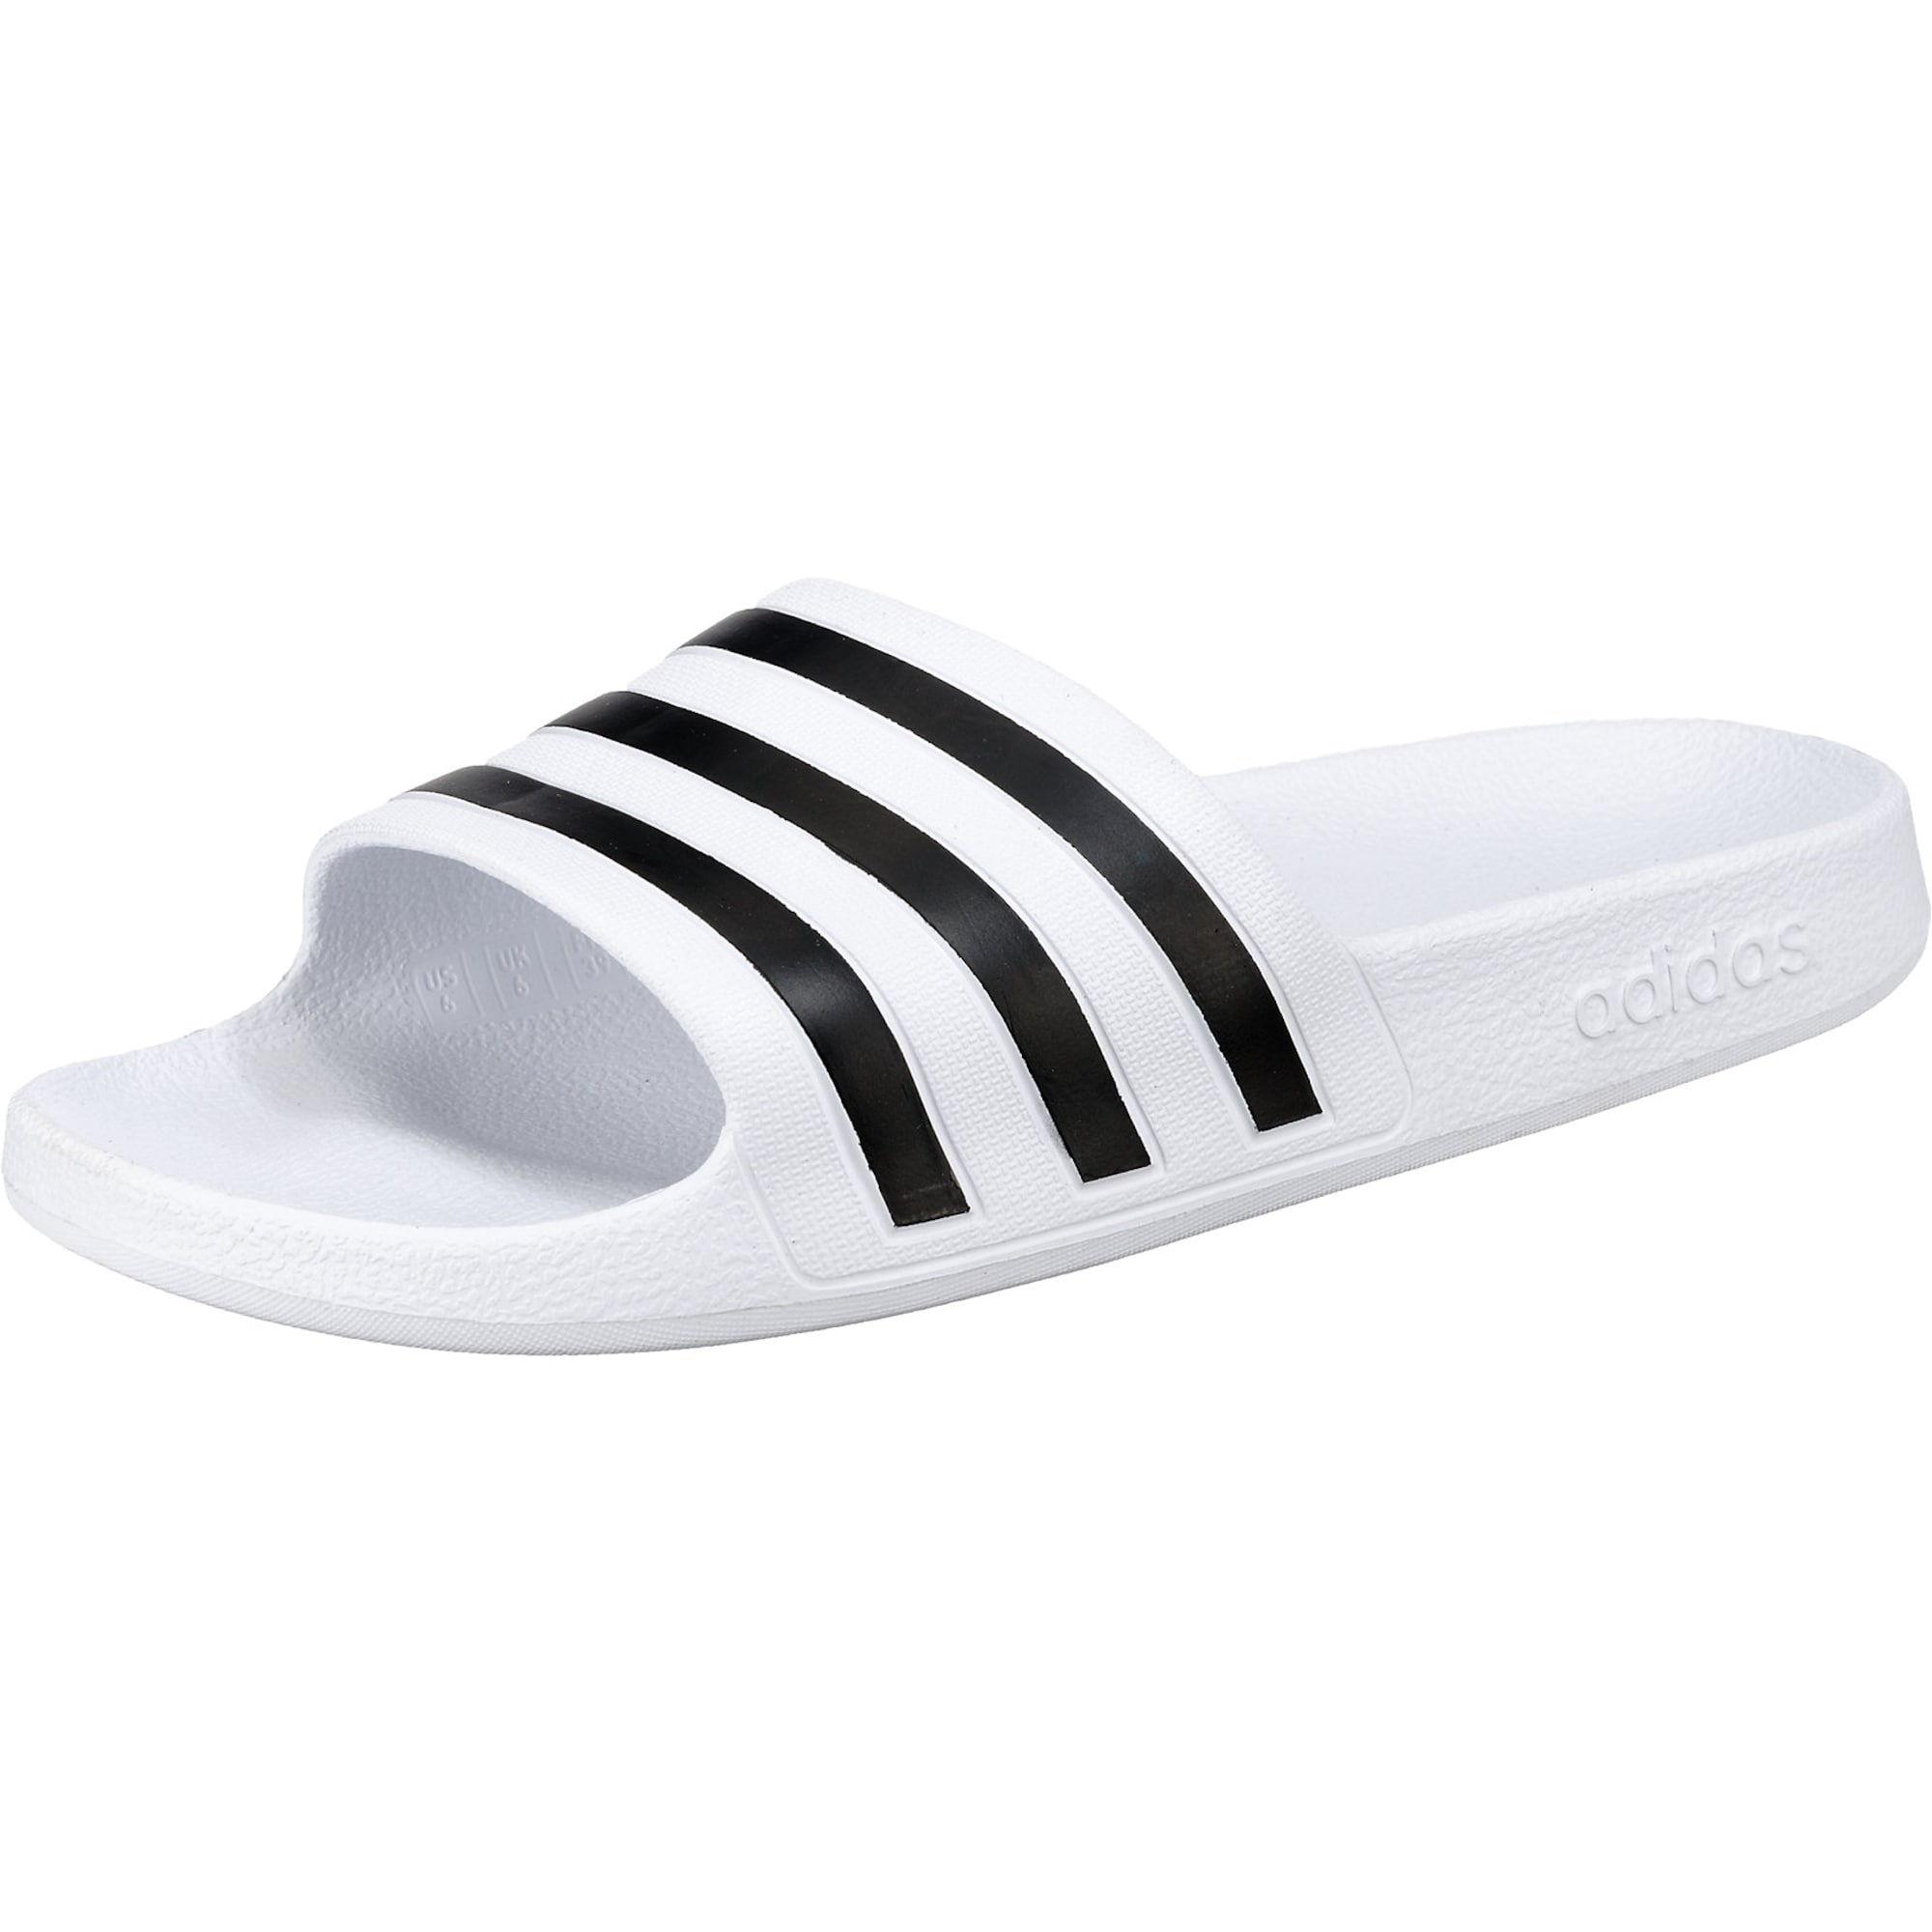 ADIDAS PERFORMANCE Sandalai / maudymosi batai 'Adilette Aqua' balta / juoda